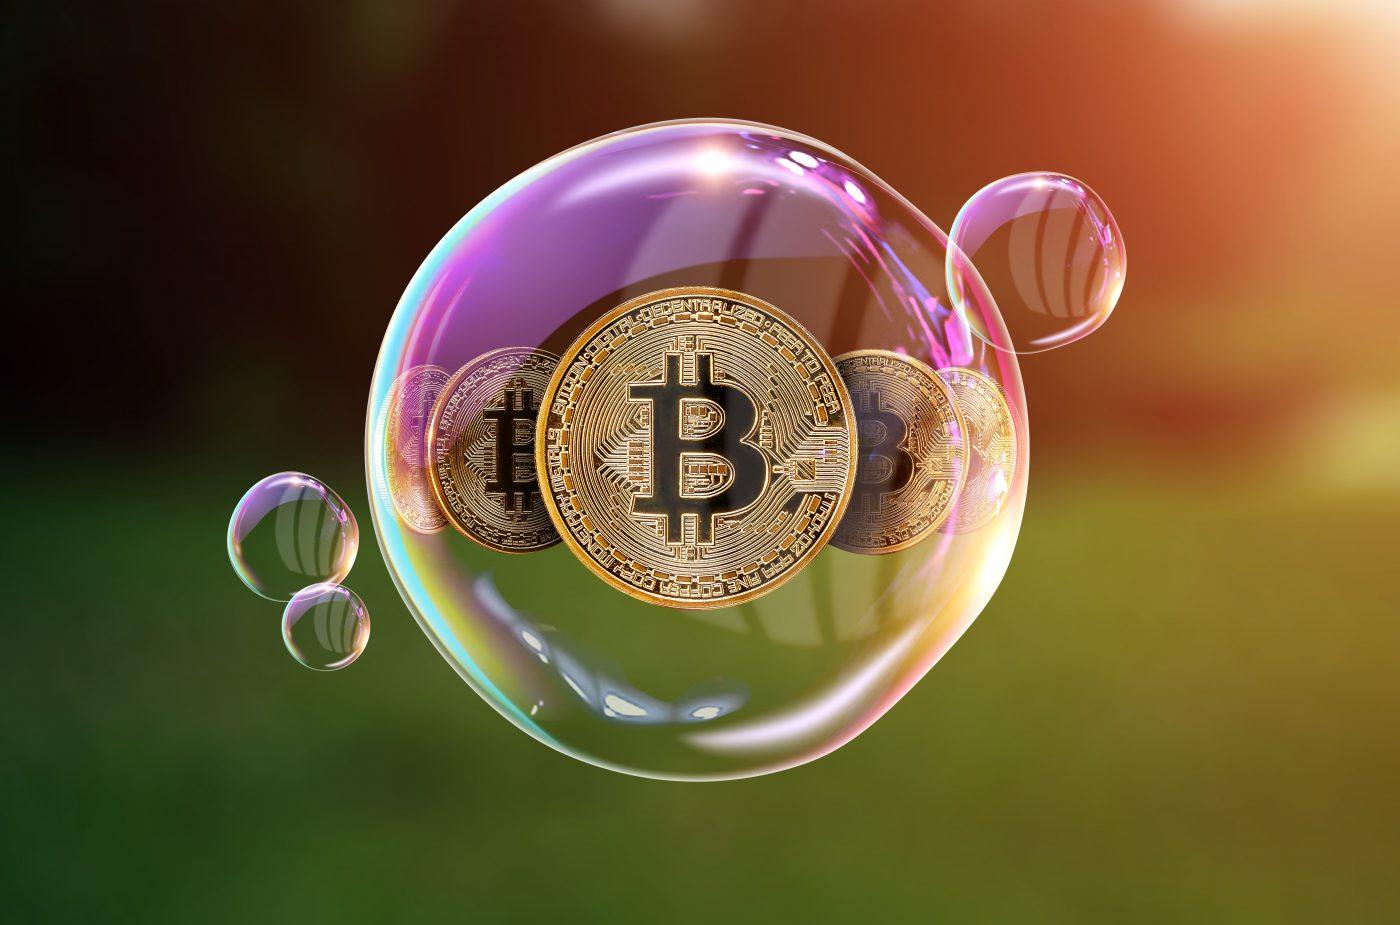 monetario-commoditie-blockchain